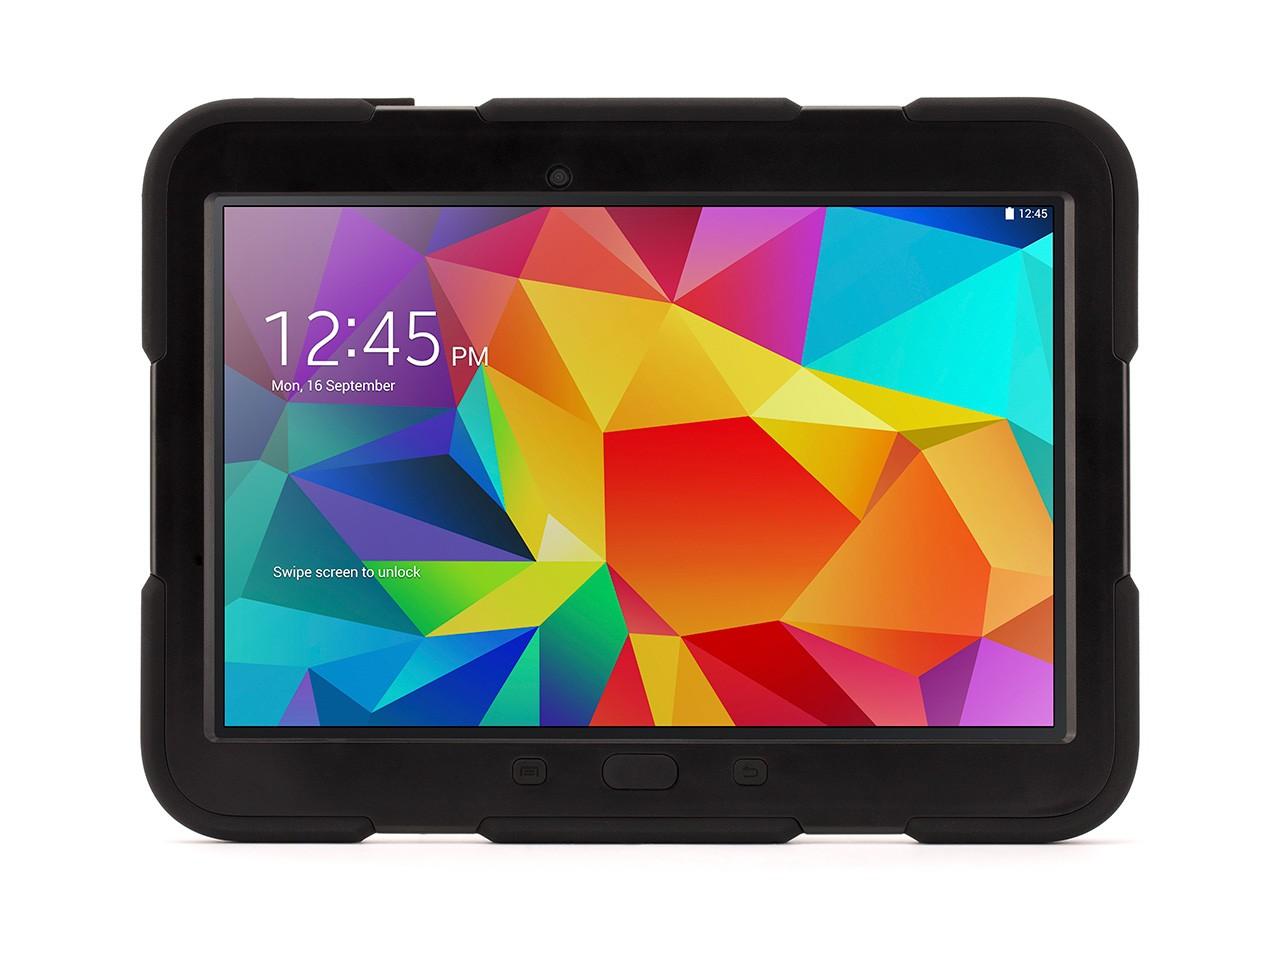 Samsung Galaxy Tab 10.1 in a Griffin Survivor